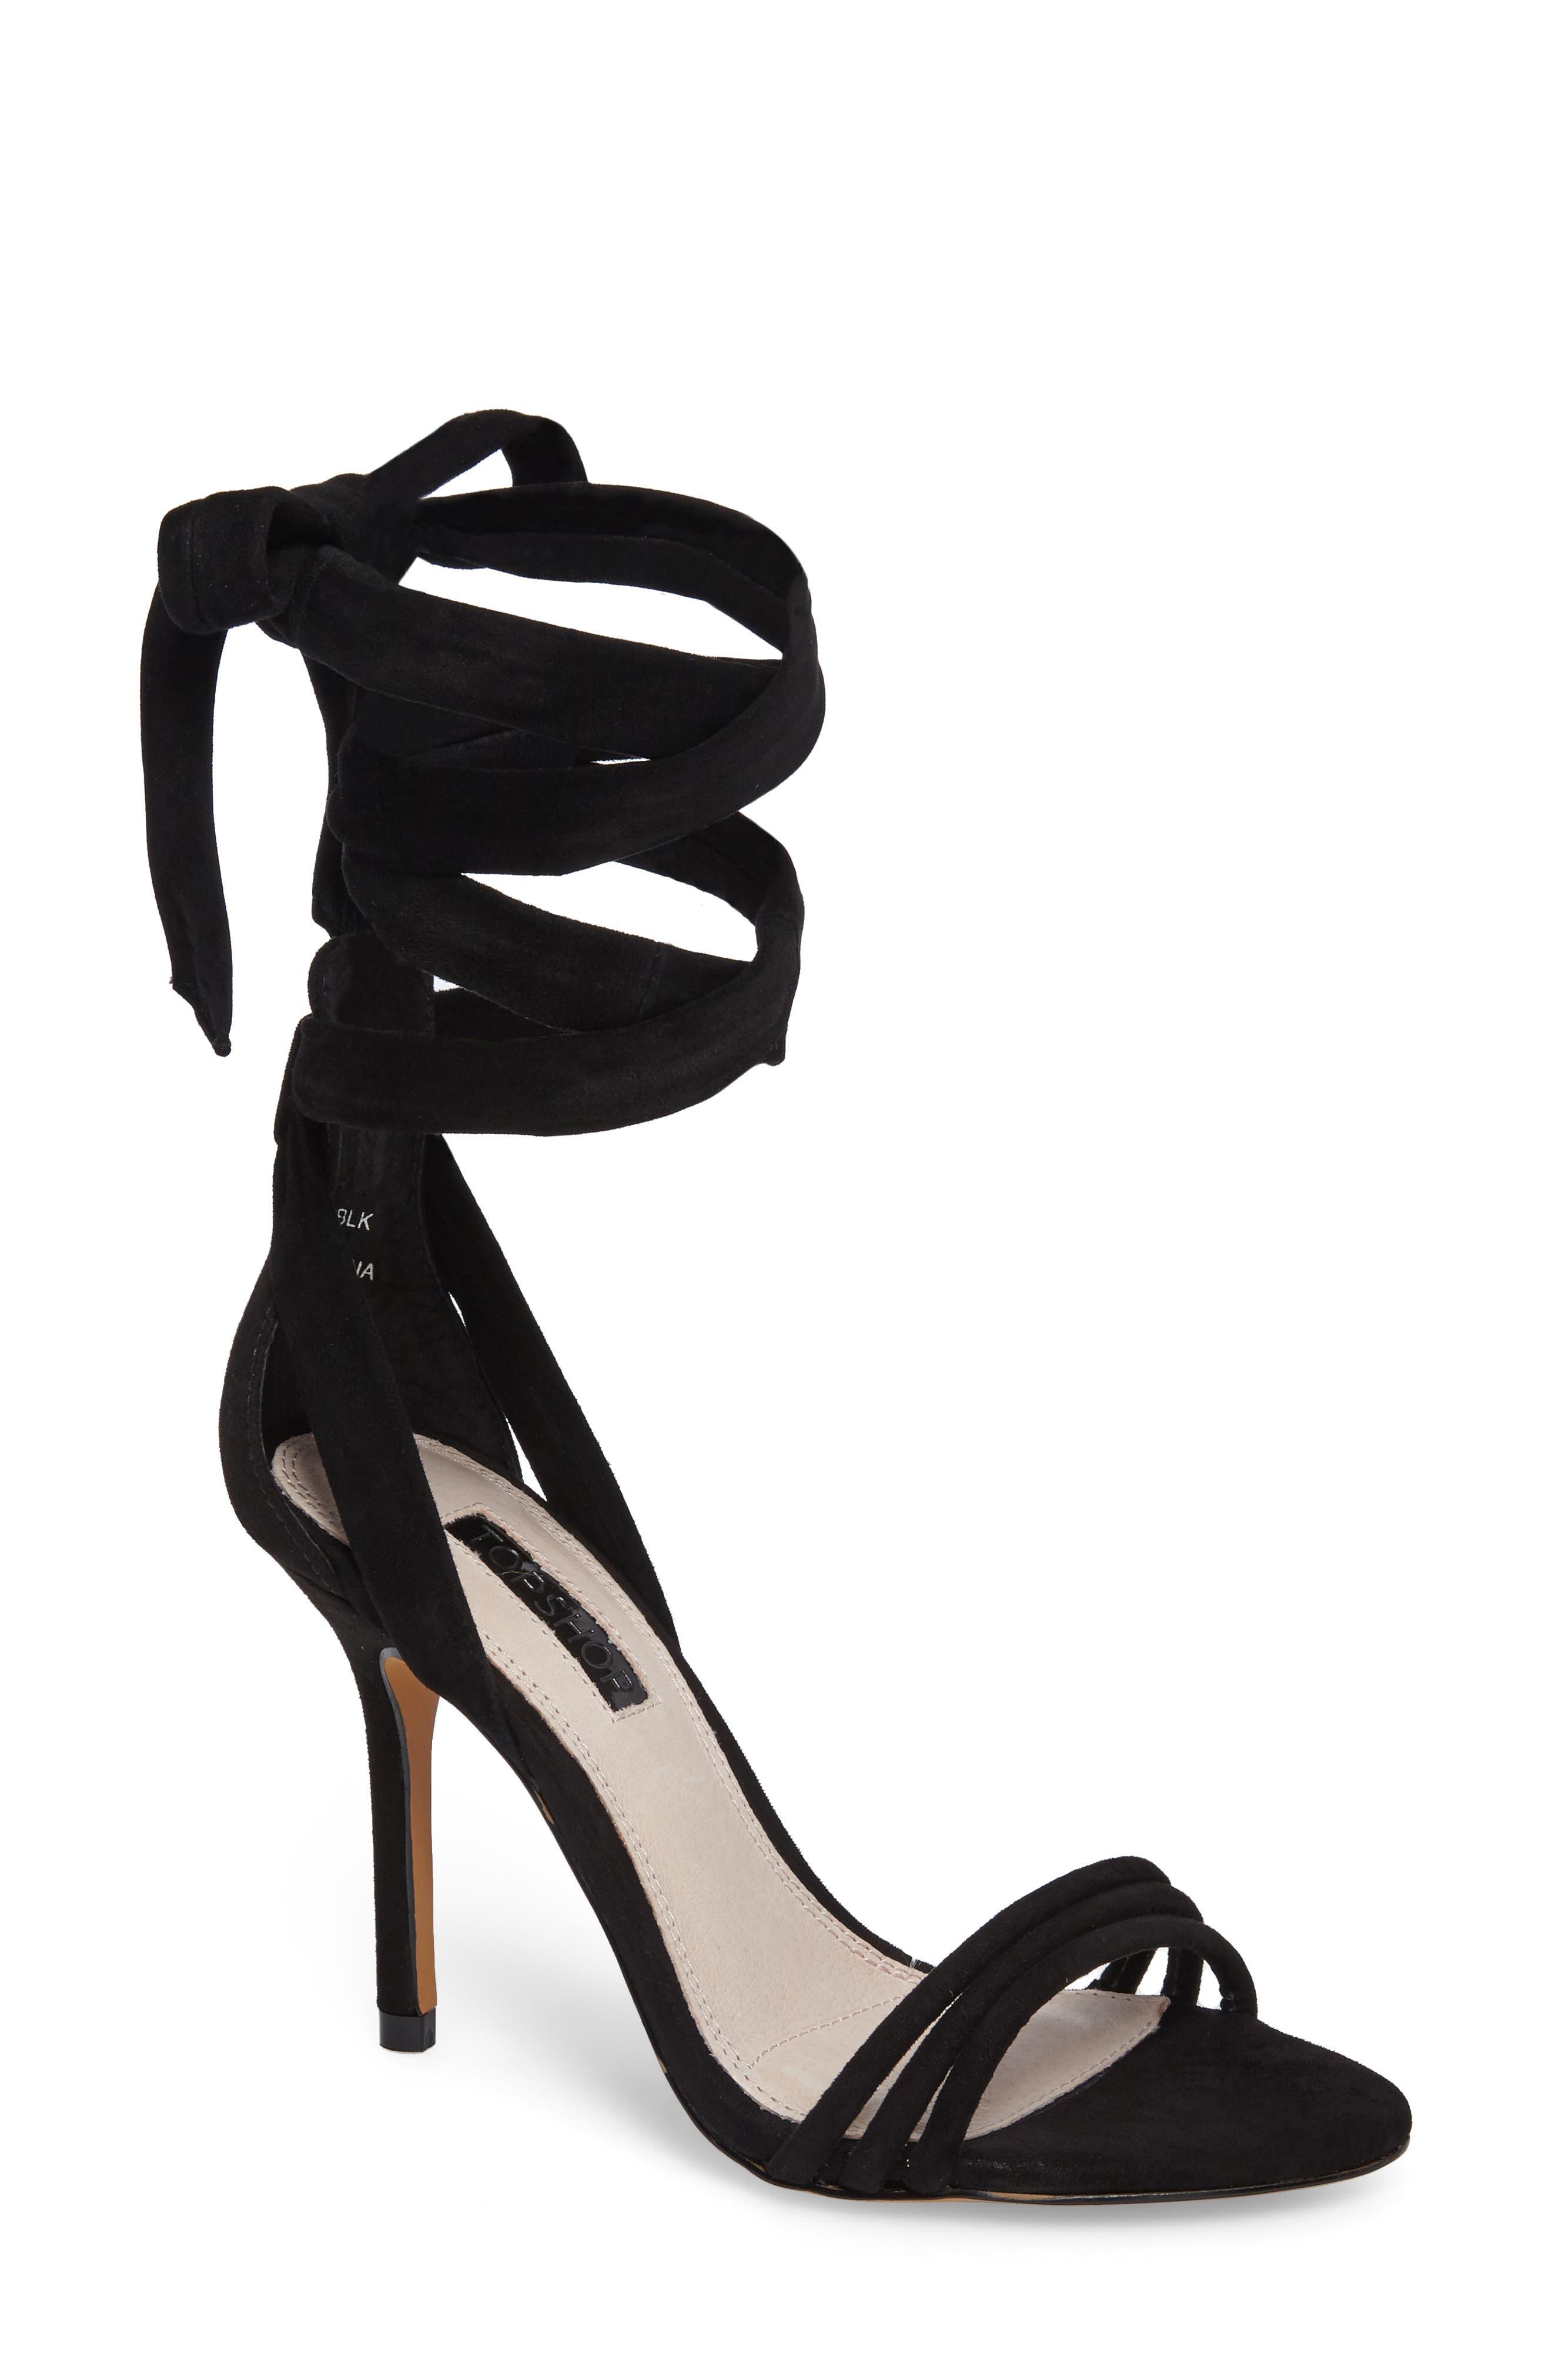 TOPSHOP Ramona Ankle Wrap Sandal, Main, color, 001